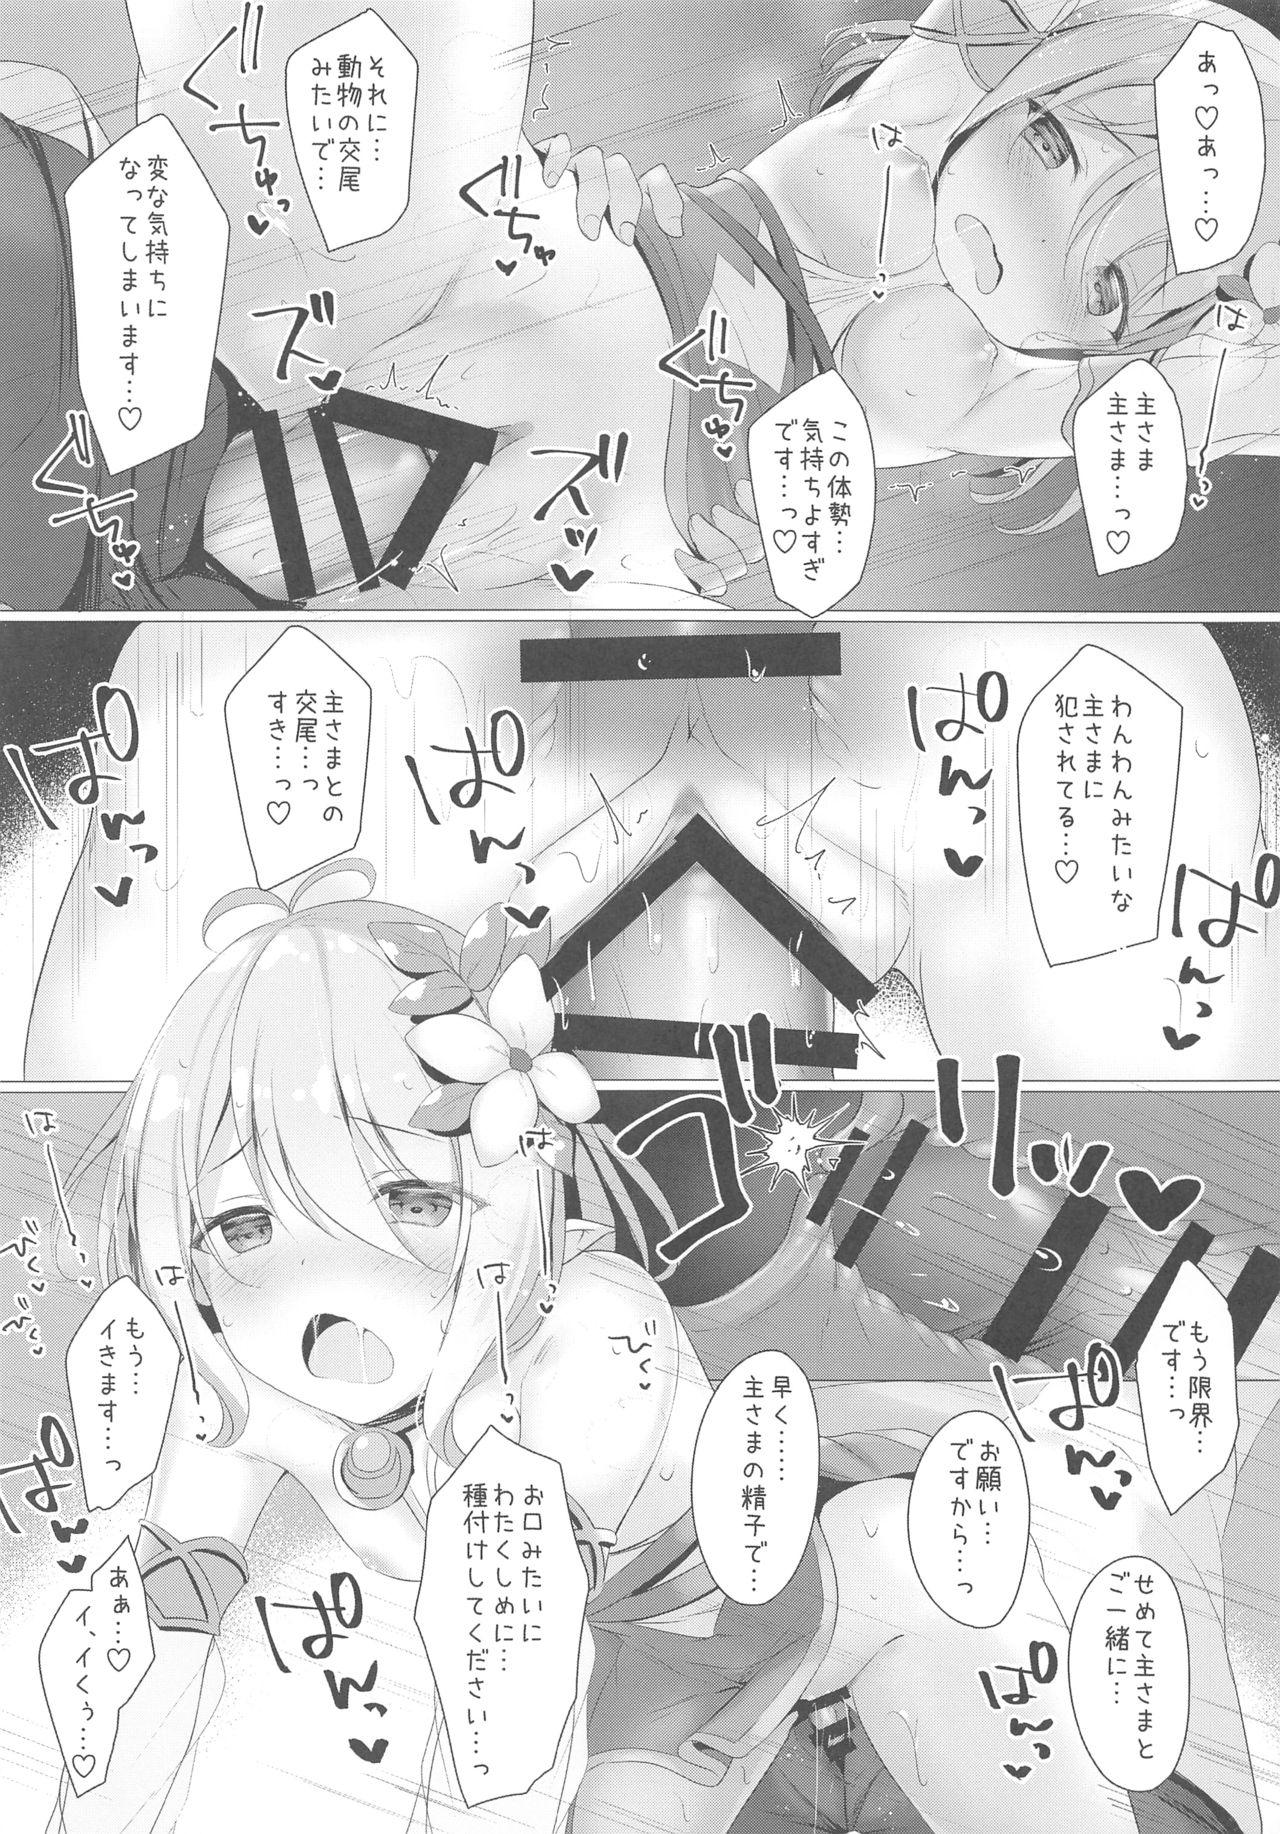 (C97) [Twilight Road (Tomo)] Kokkoro-chan to Connect Shitai! -Re:Dive‐ (Princess Connect! Re:Dive) 16